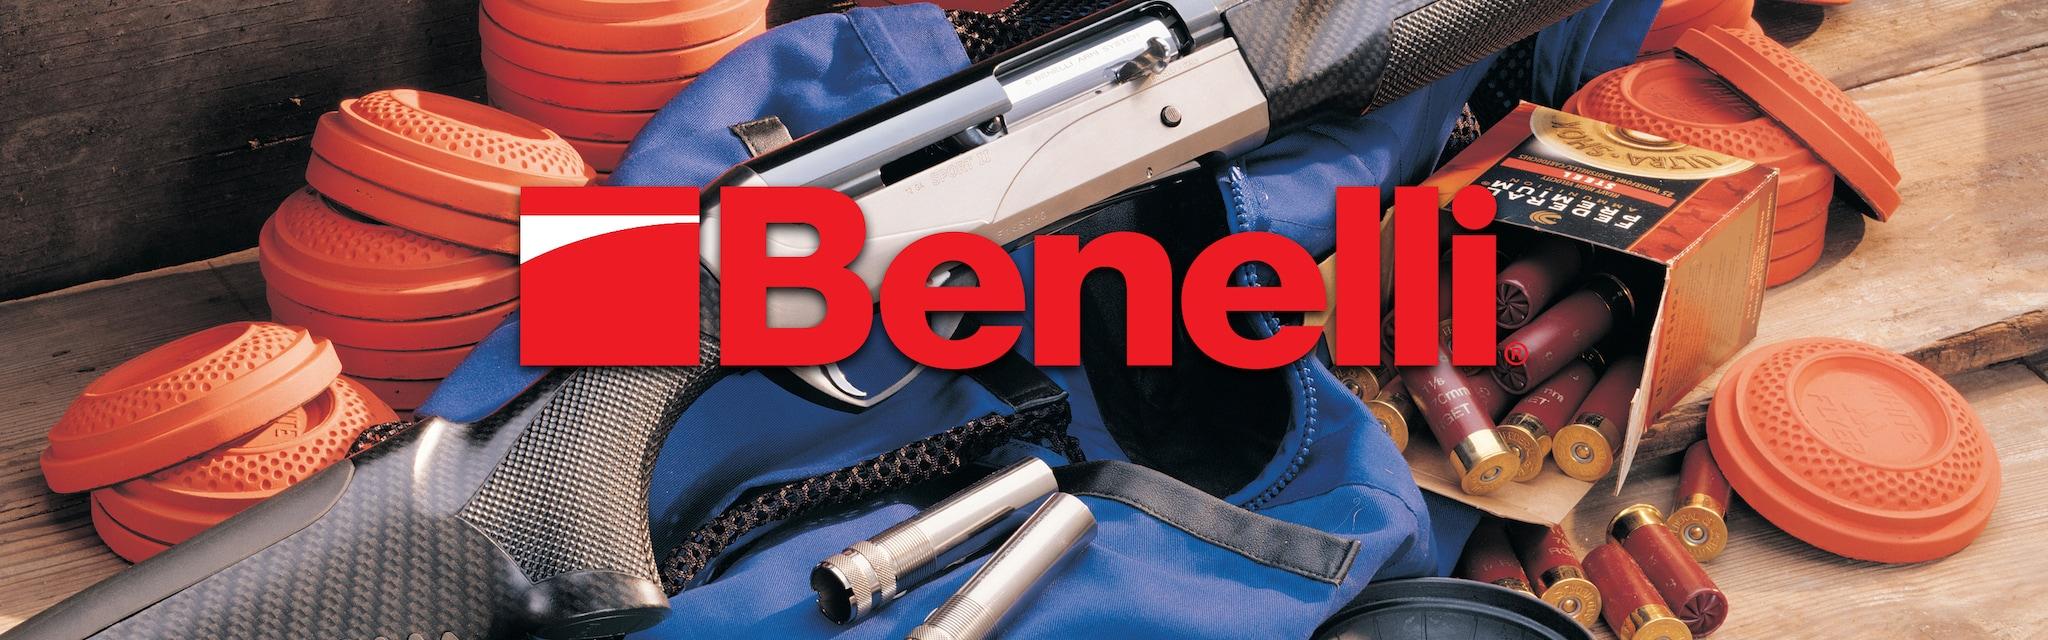 Benelli brand image